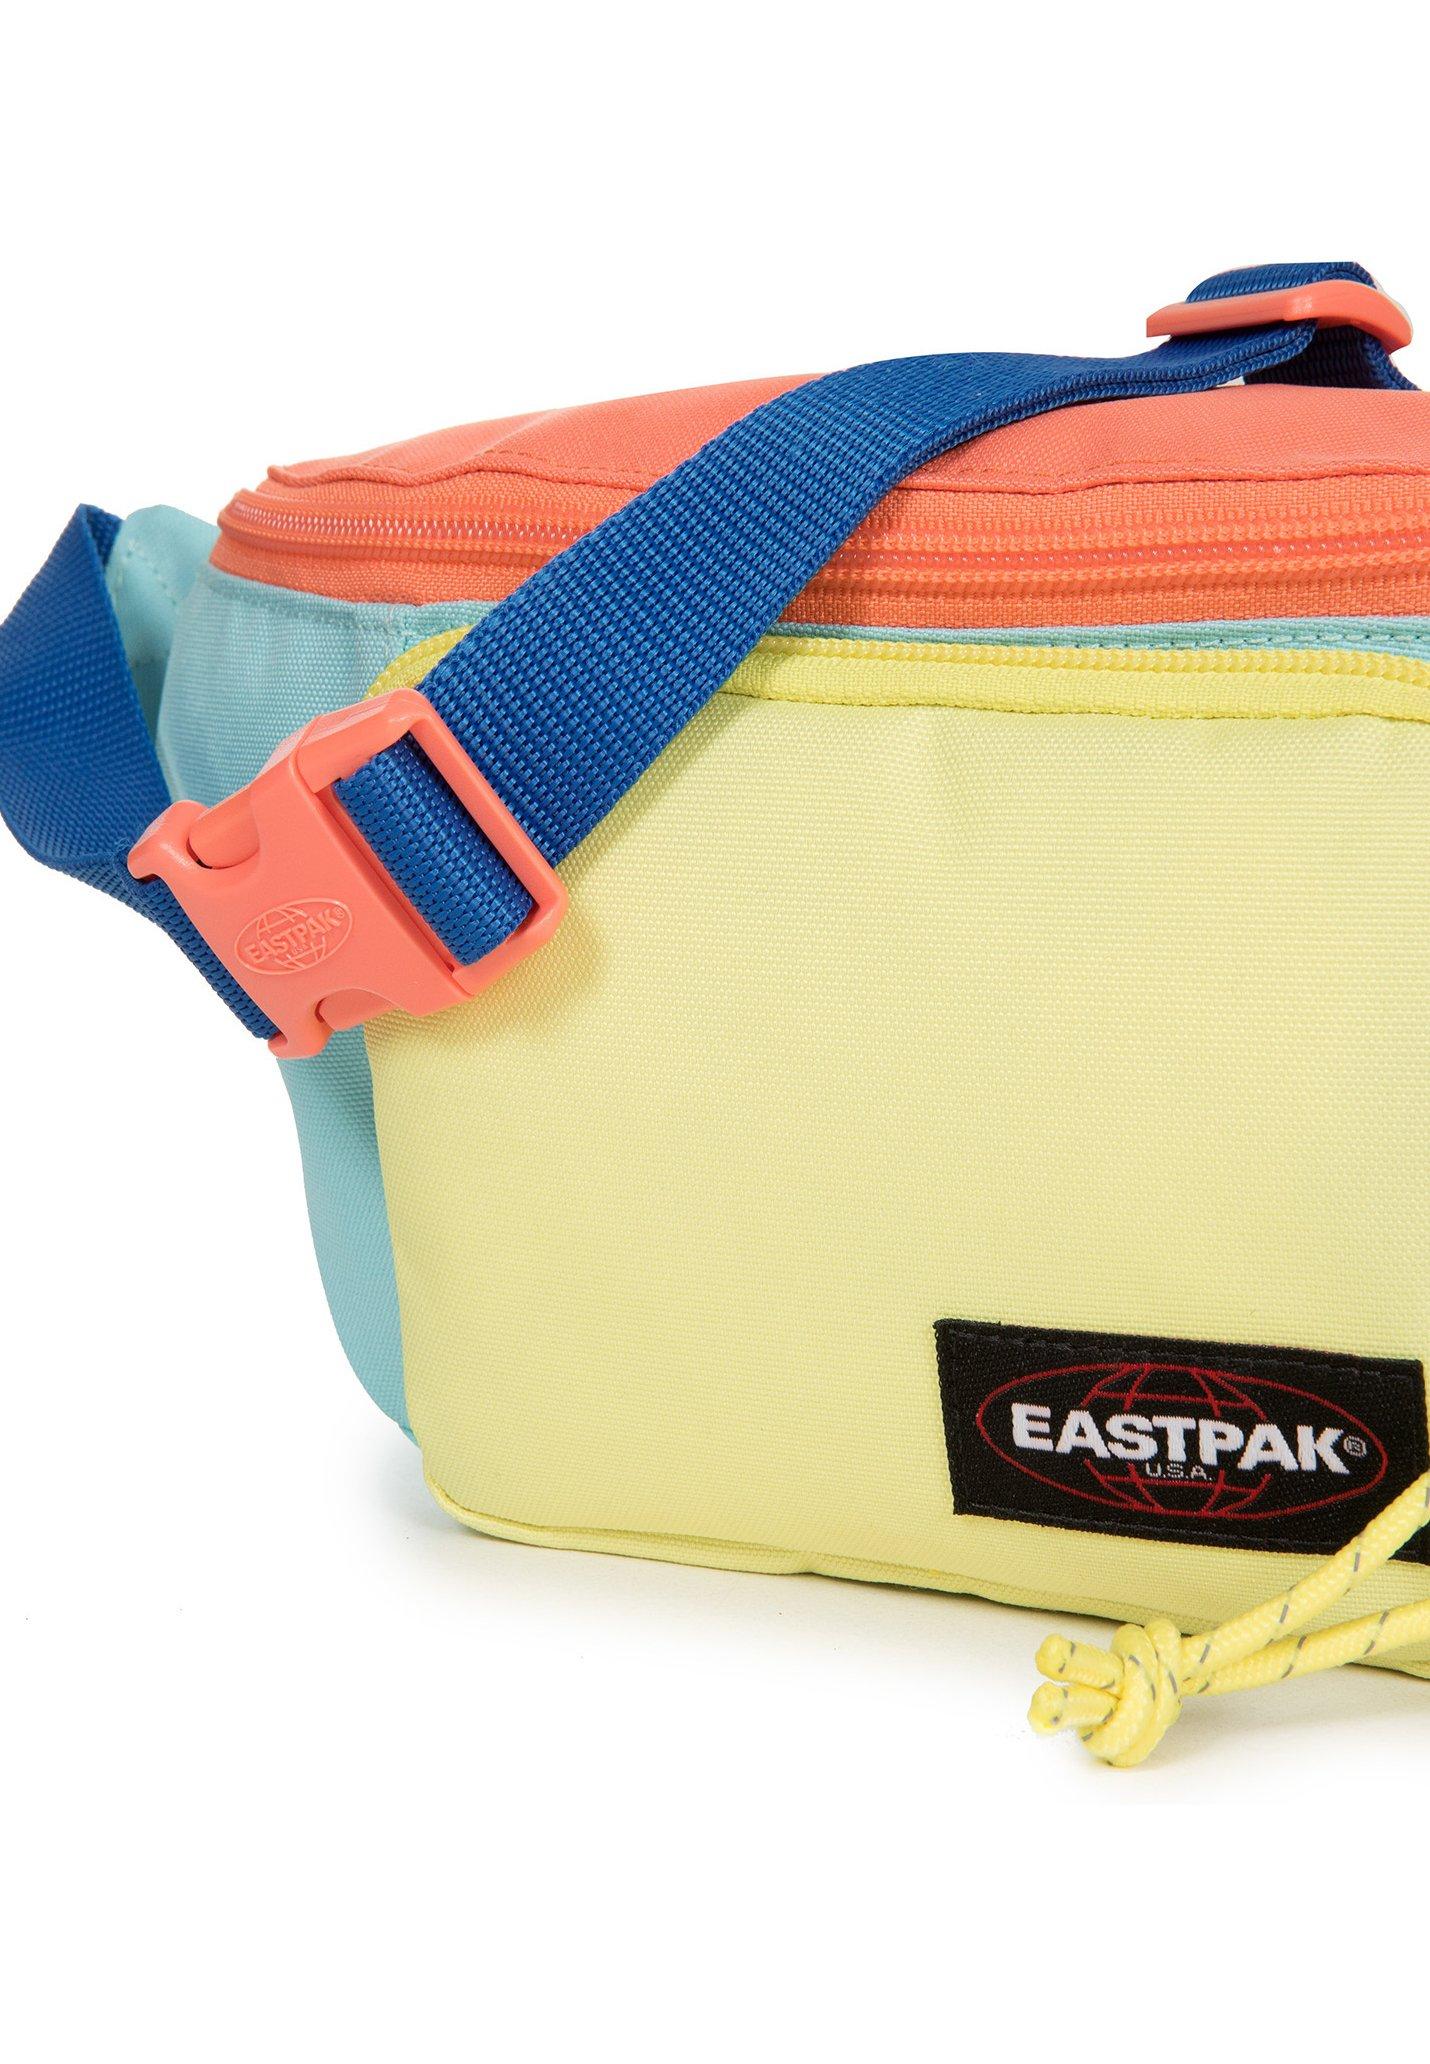 Eastpak Color Blocked - Sac Banane Multi-coloured